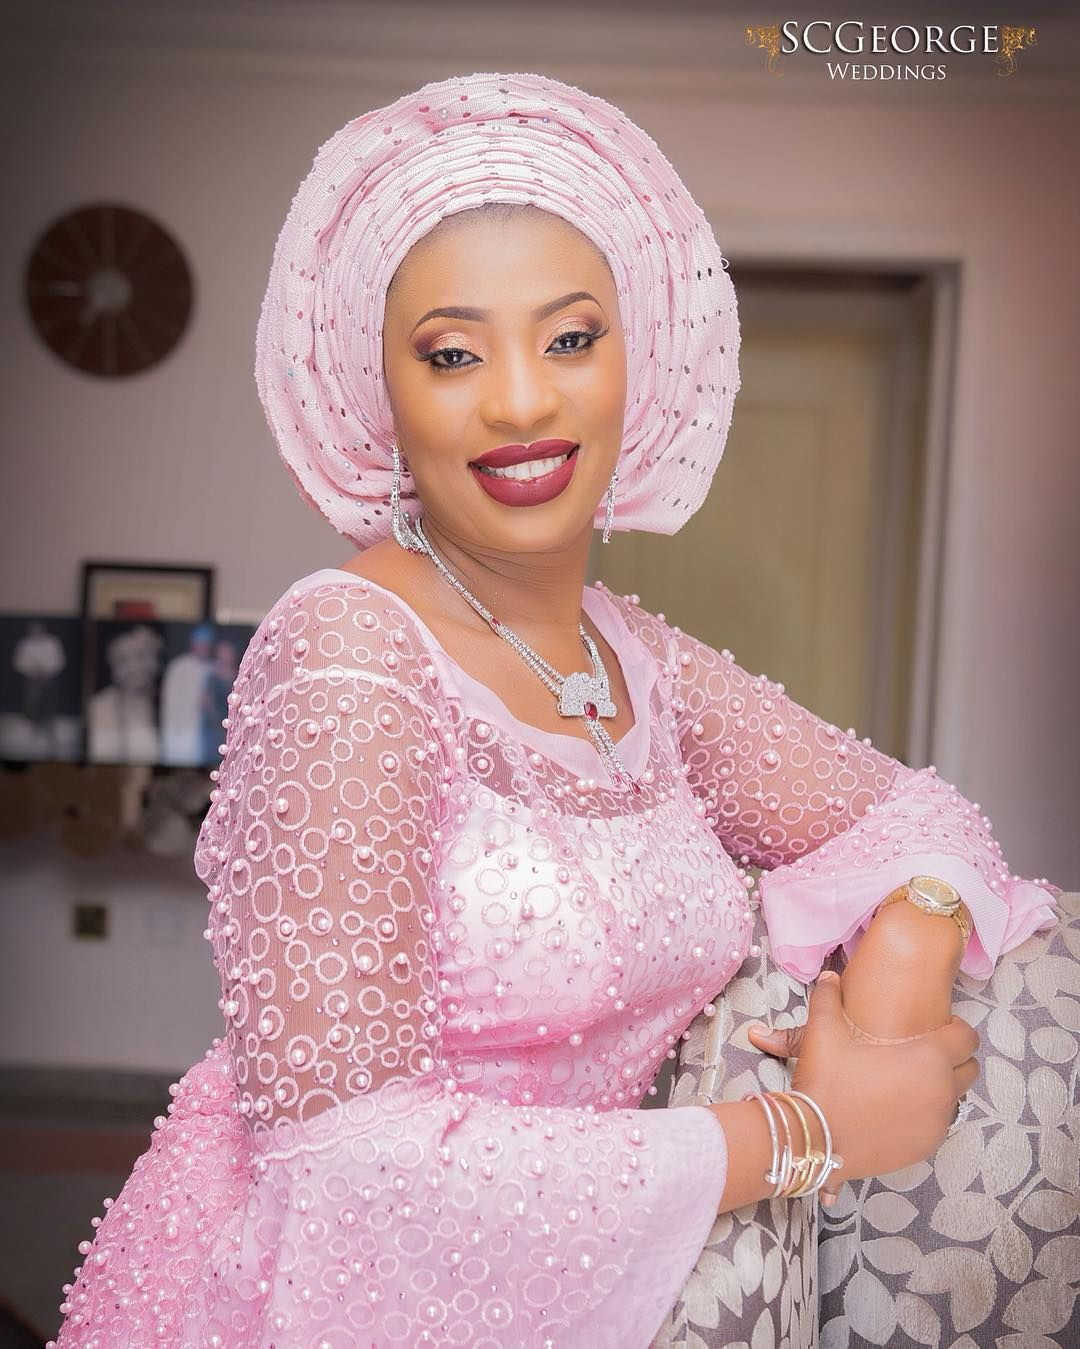 Pin de valerie thomas en African Weddings | Pinterest